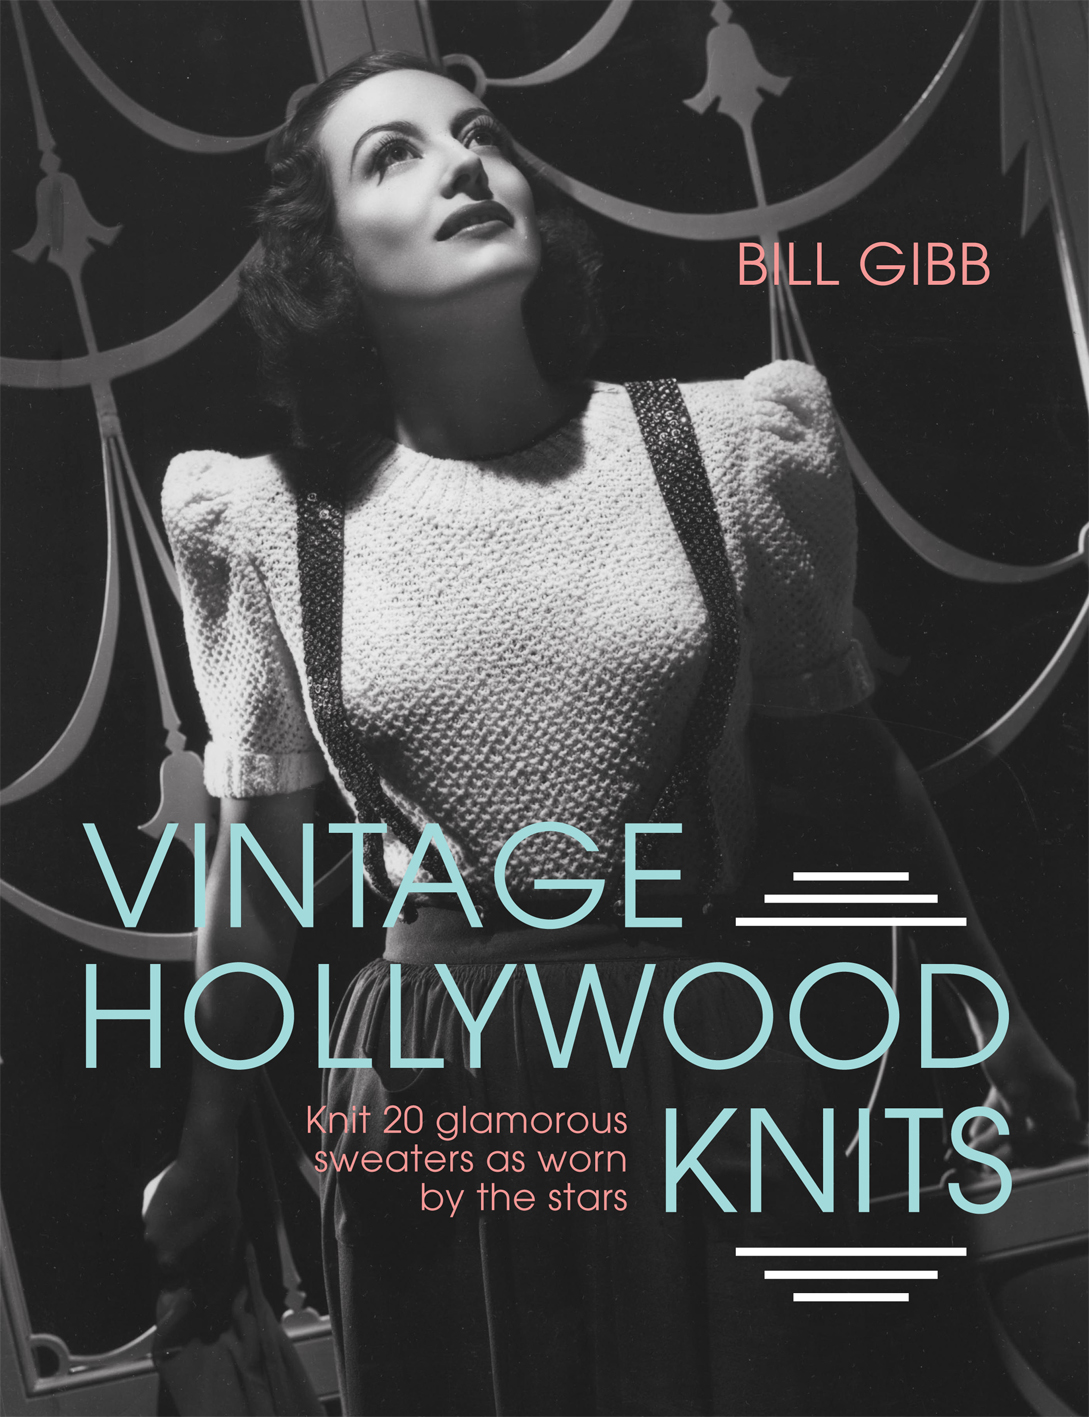 Vintage Hollywood Knits